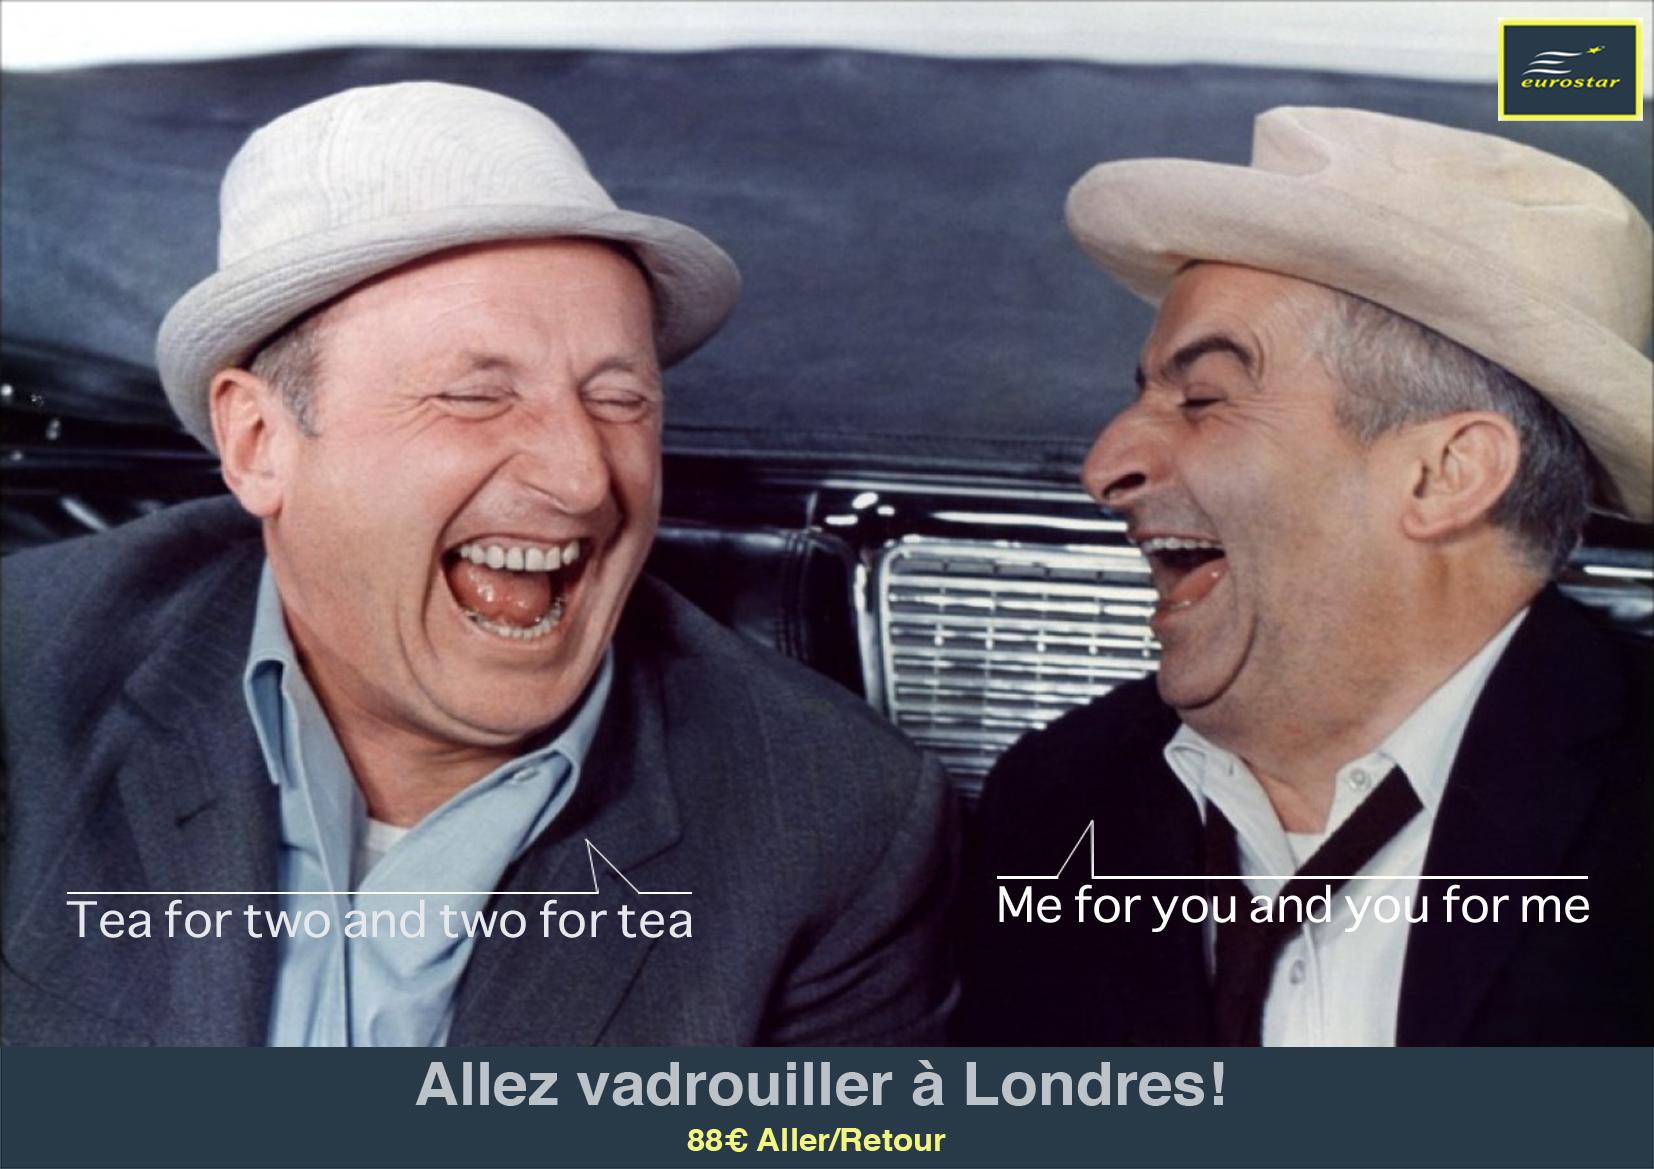 funes fous rire eurostar.jpg